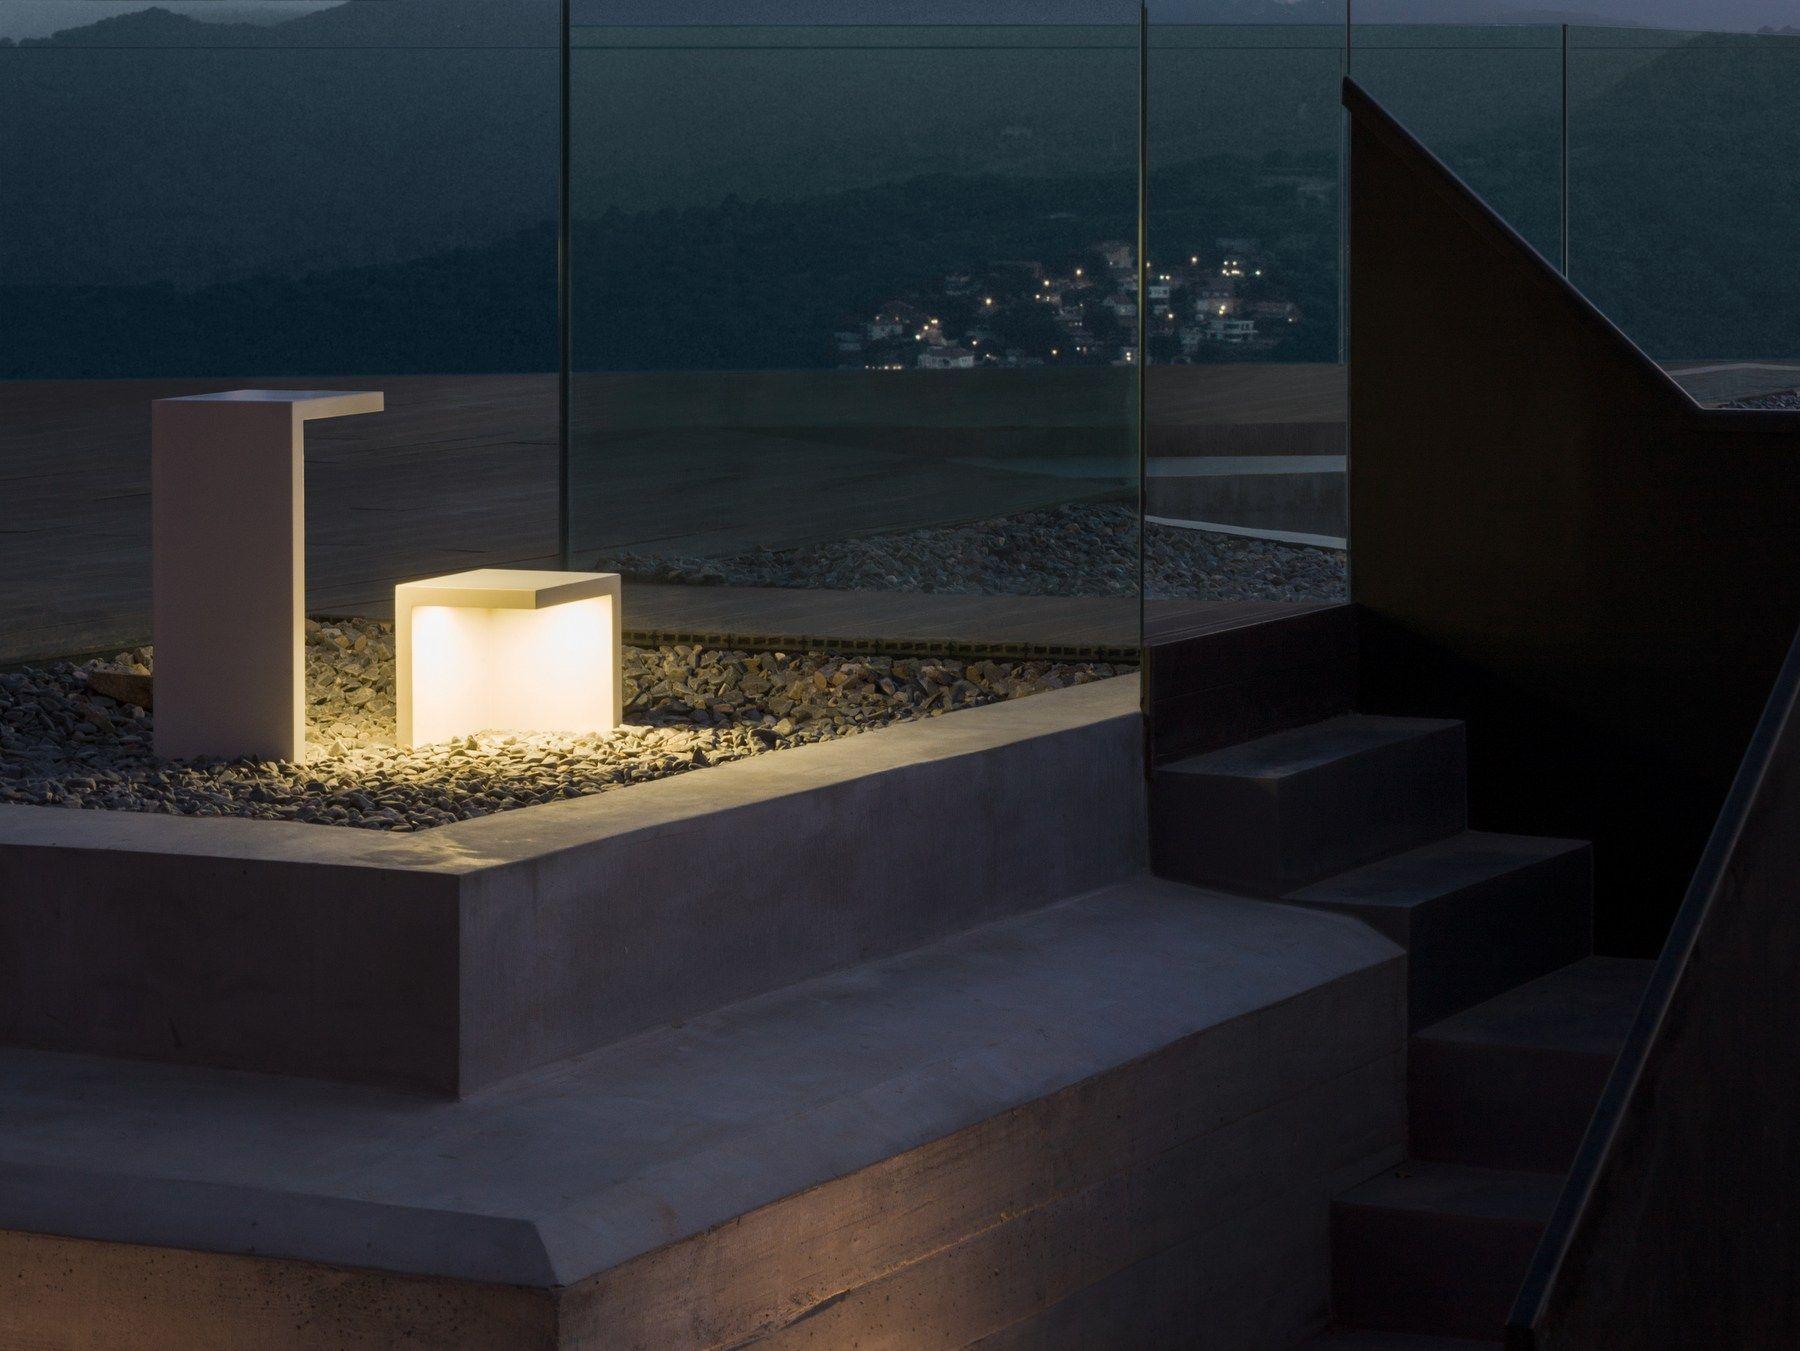 LED CEMENT FLOOR LAMP EMPTY BY VIBIA DESIGN JOSEP LLU S XUCL